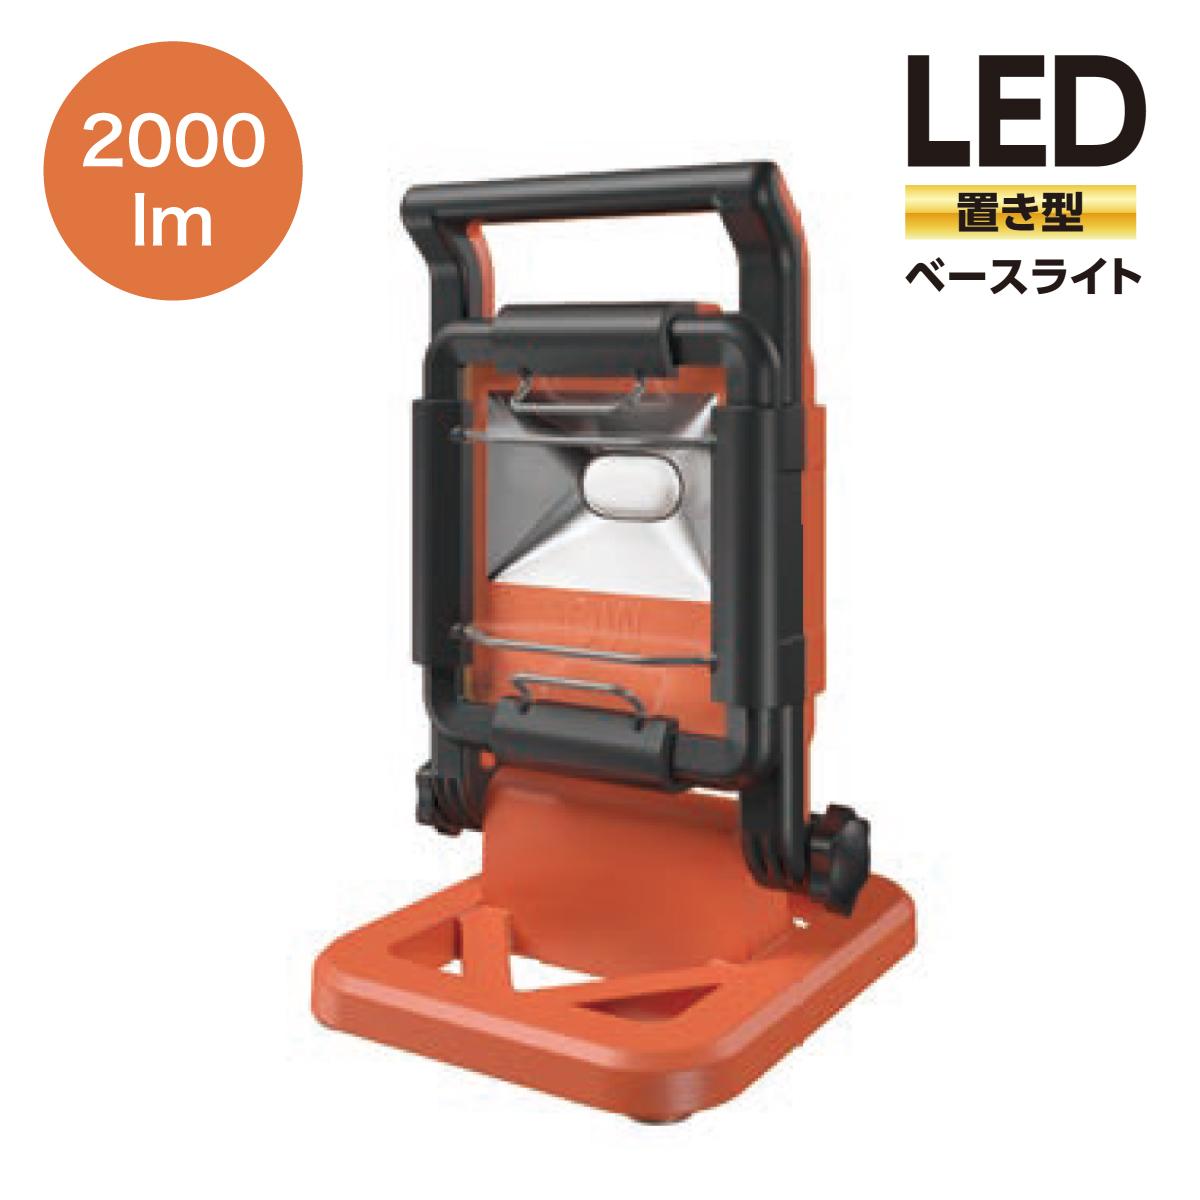 LEDベースライト 返品交換不可 ワークライト 期間限定の激安セール 照明 省電力 長寿命 防水 ライト 防塵 2000lm ブルズLEDワークライトシリーズ LWT-2000BA LEDスタンドライト